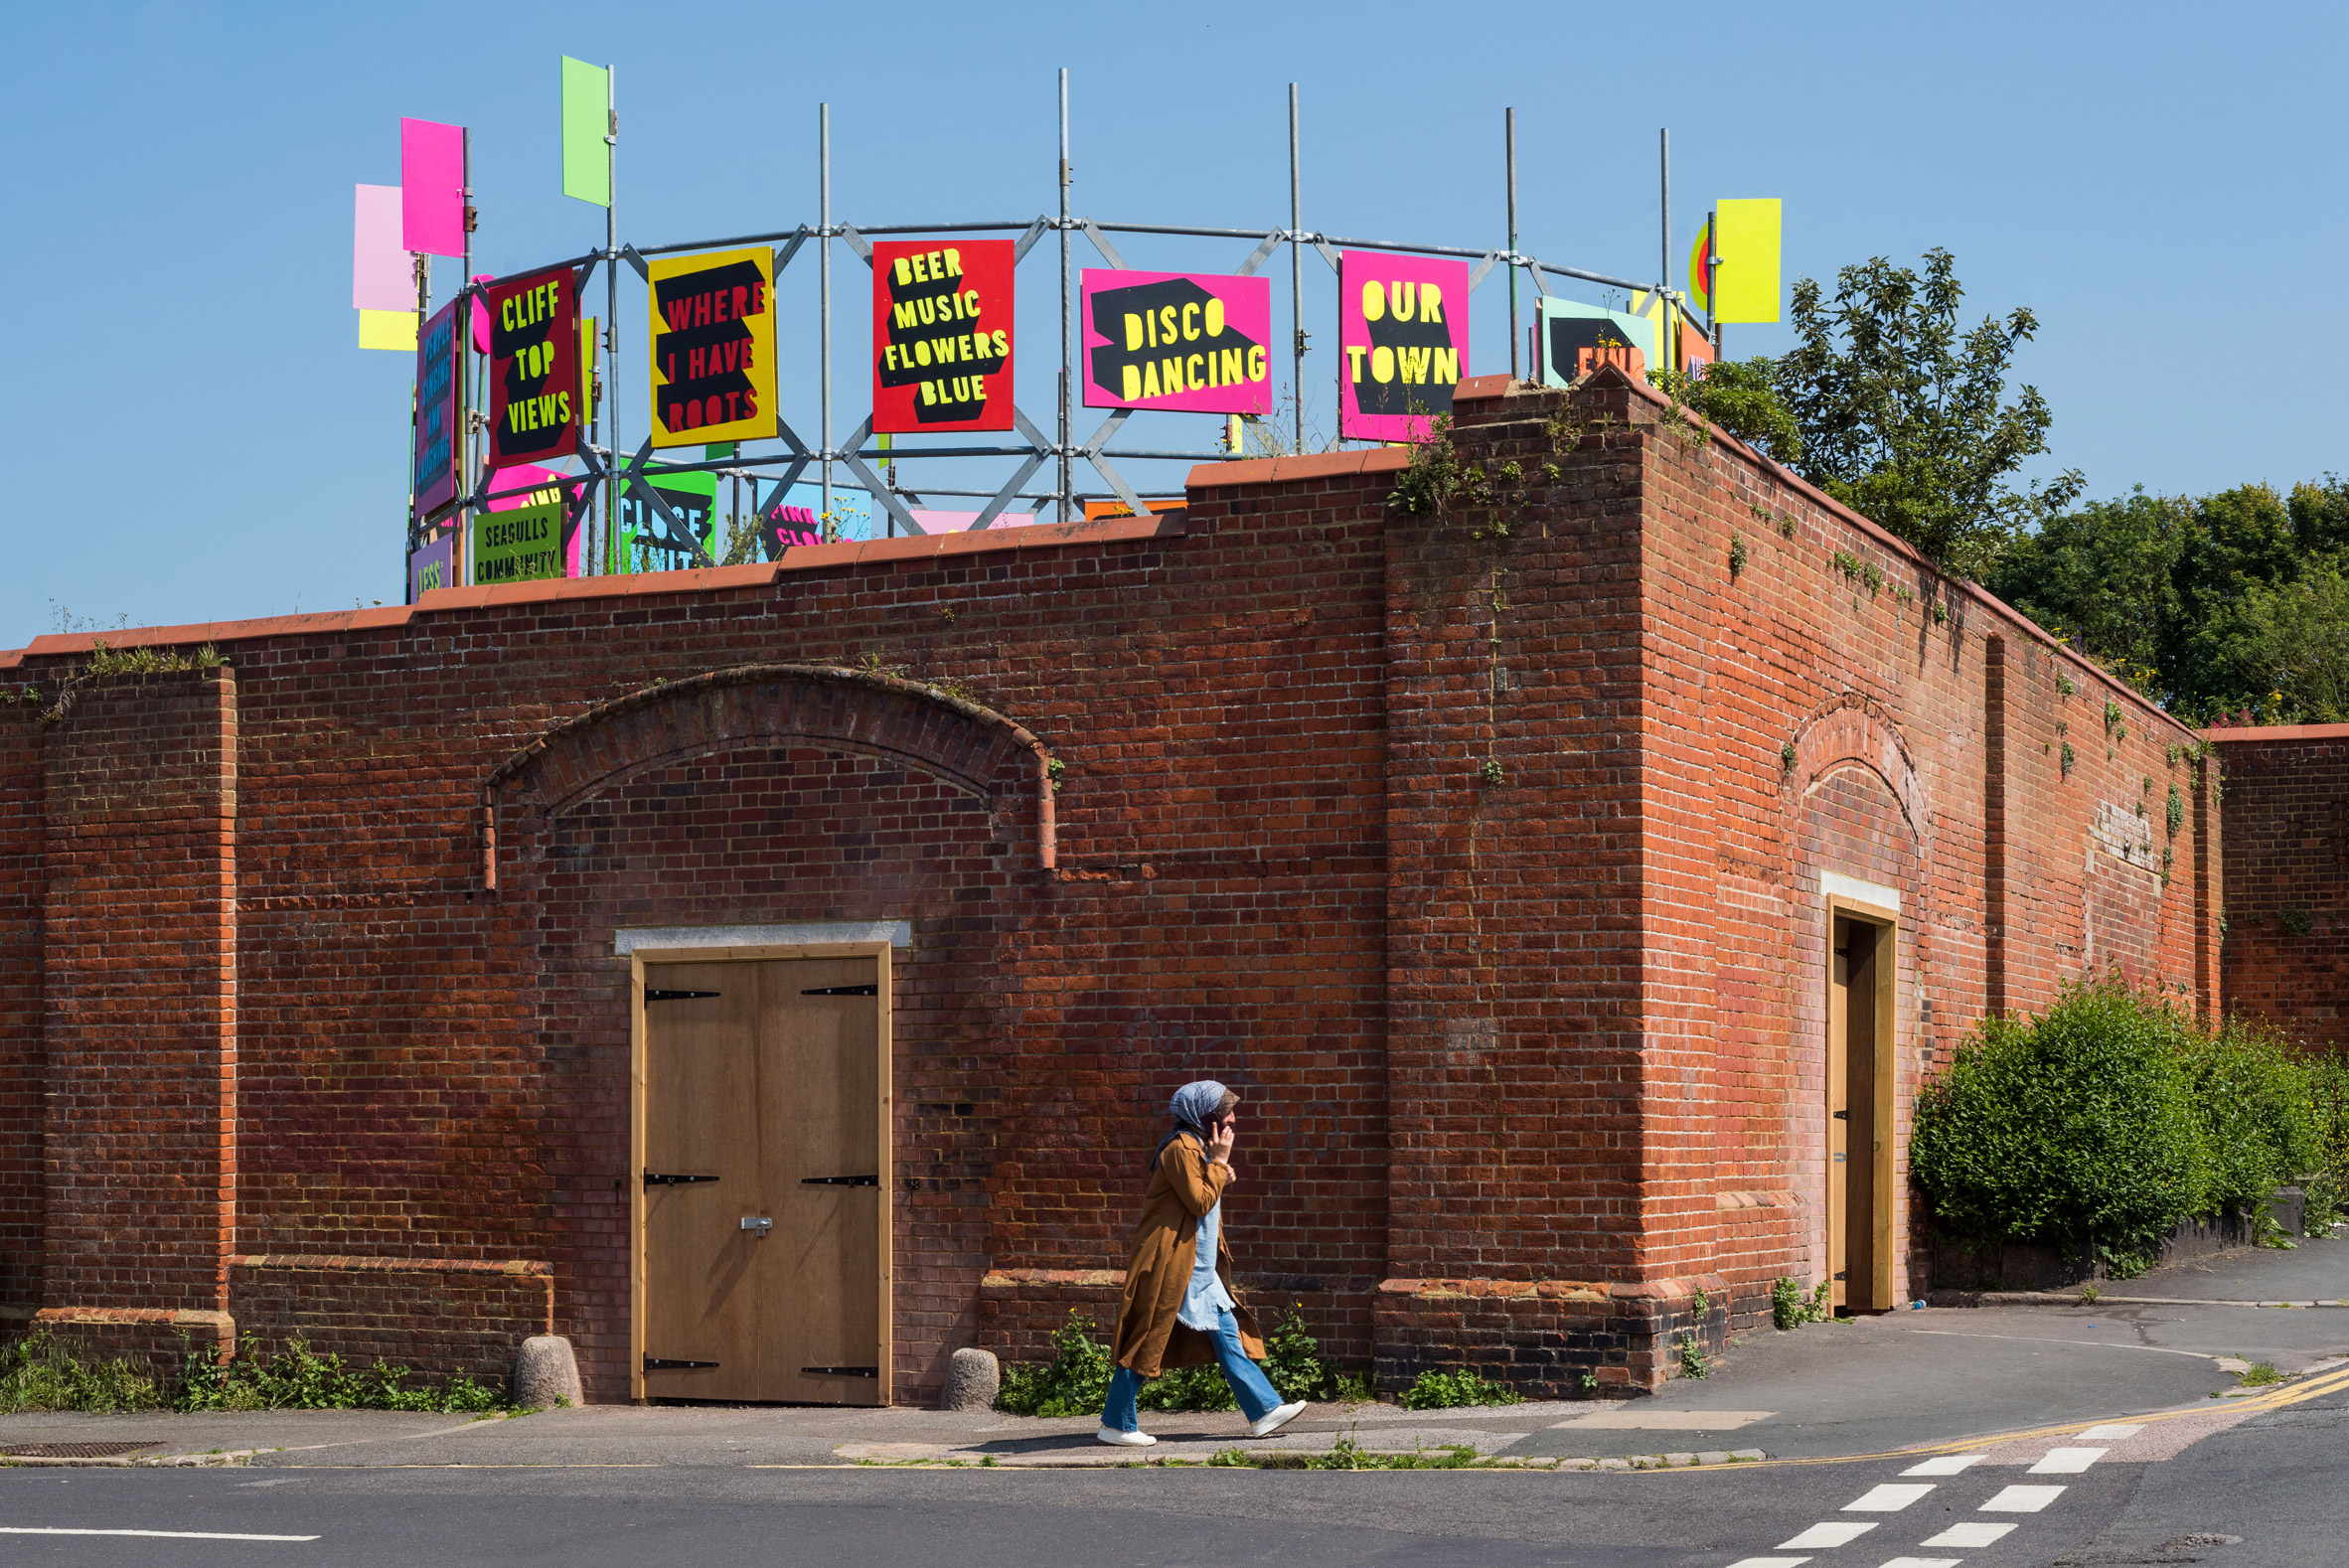 Colourful gasworks installation by Morag Myerscough behind a red brick wall at Folkestone Triennial 2021